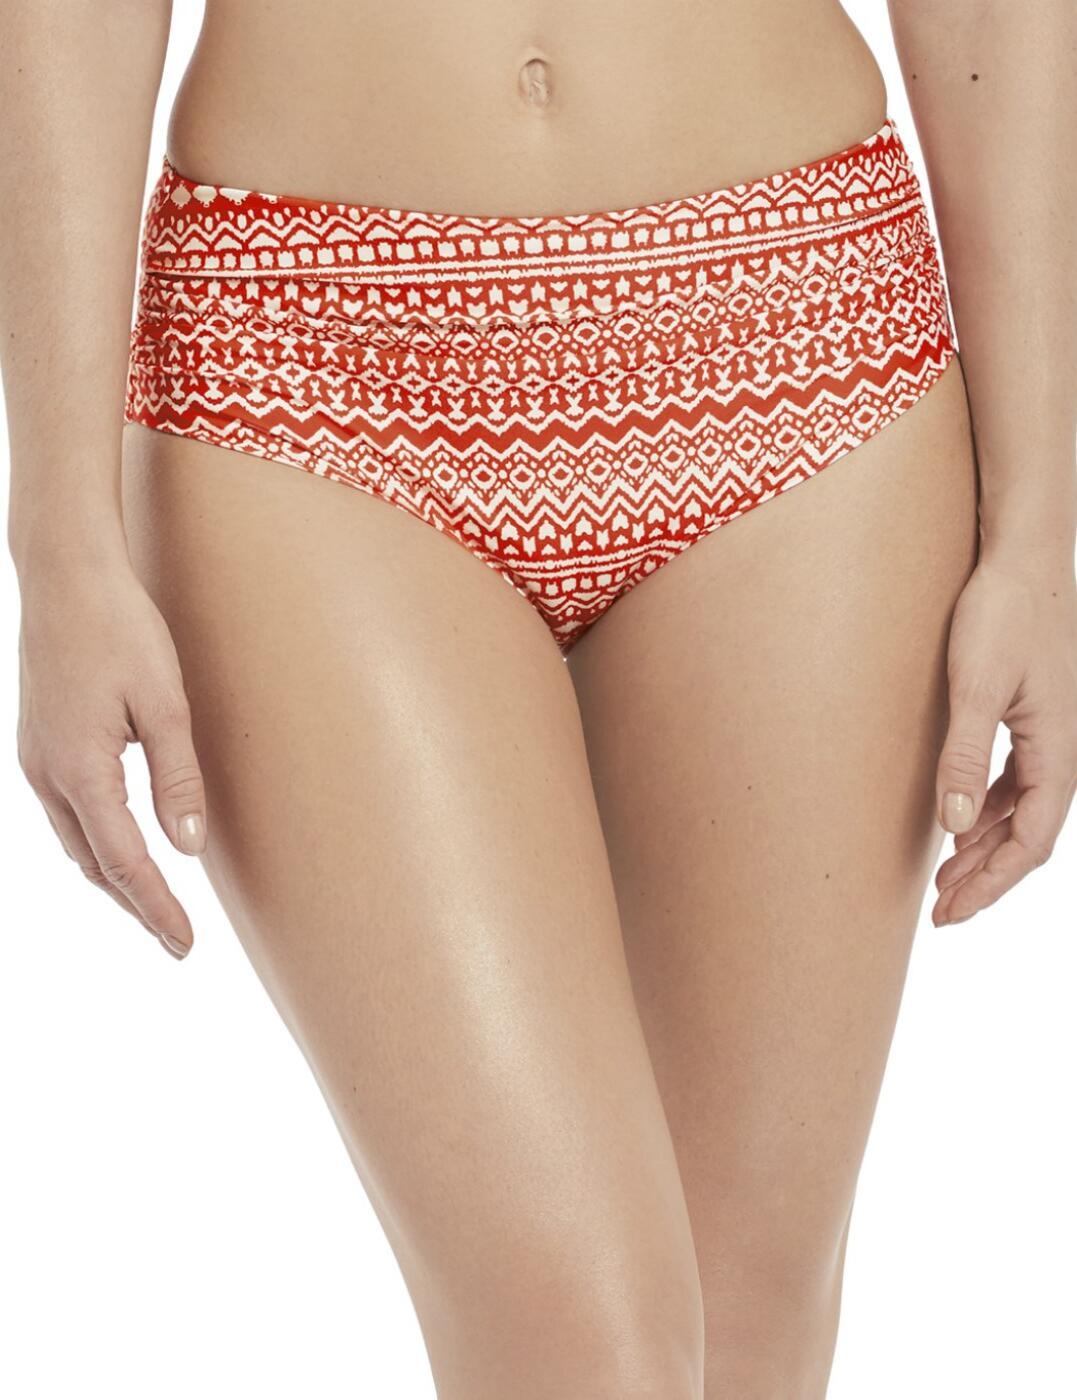 6434 Fantasie Sidari Deep Gathered Bikini Brief - 6434 Grenadine